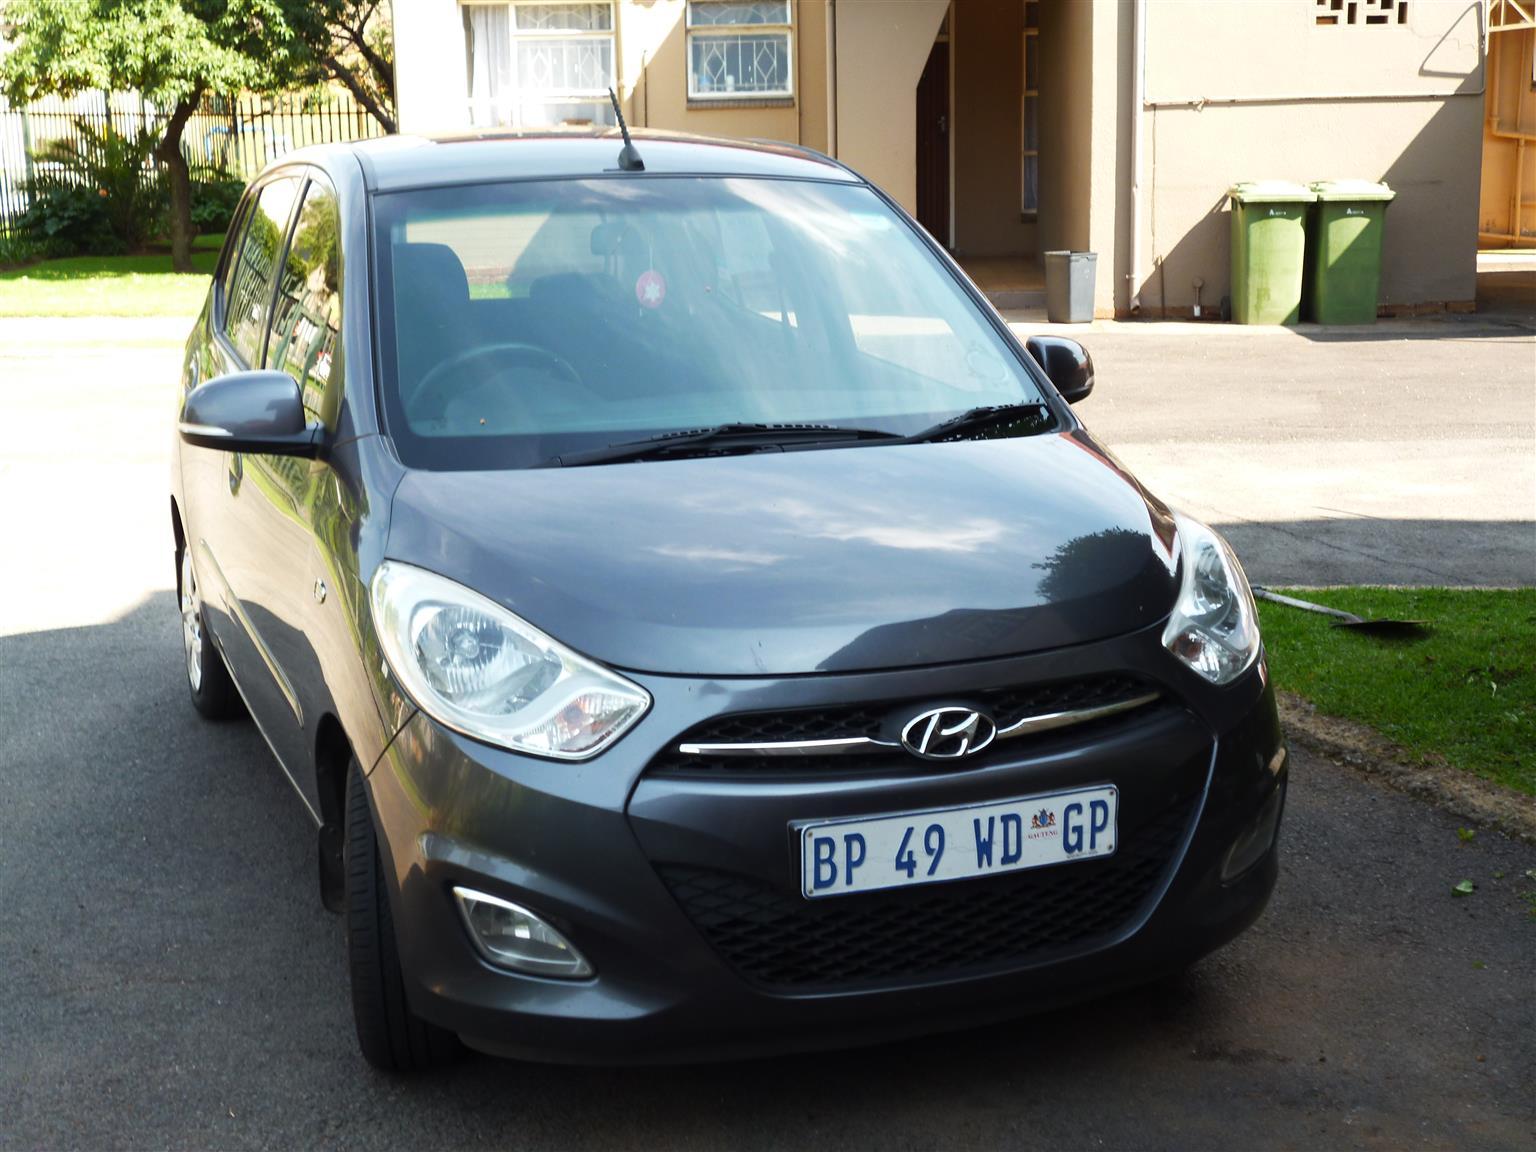 2011 Hyundai i10 1.2 GLS high spec